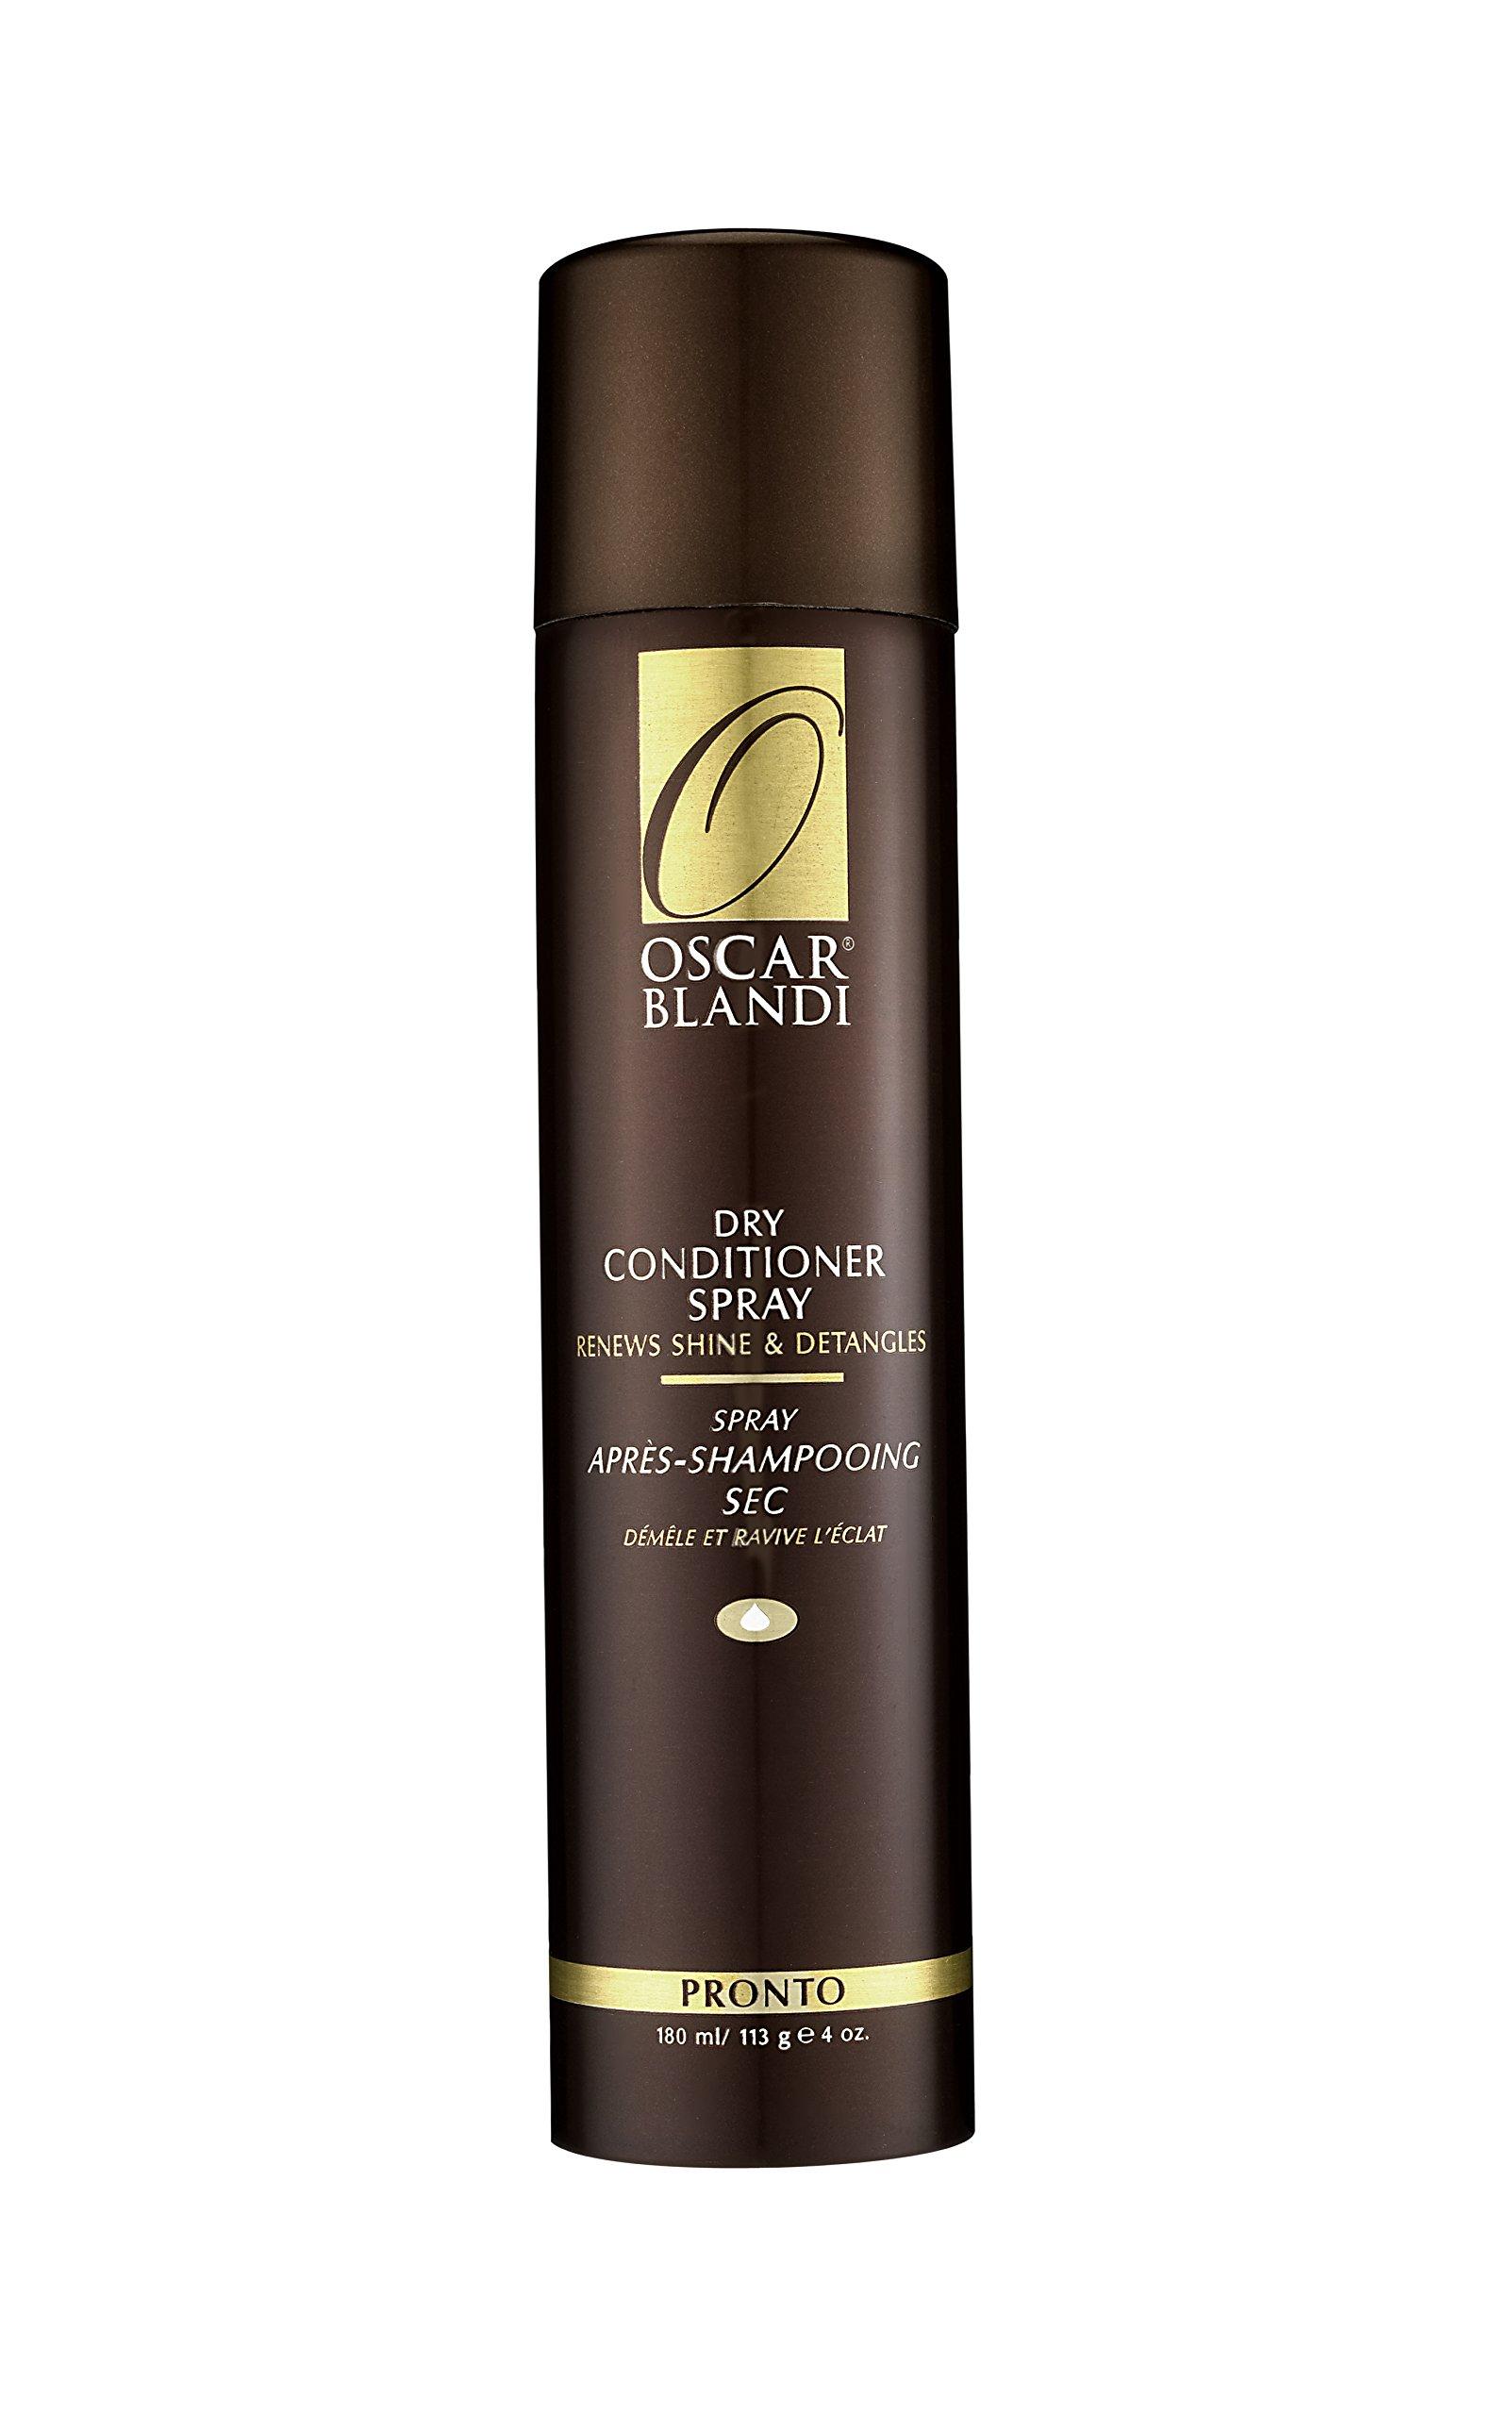 Oscar Blandi Pronto Dry Conditioner Spray, 4 Oz